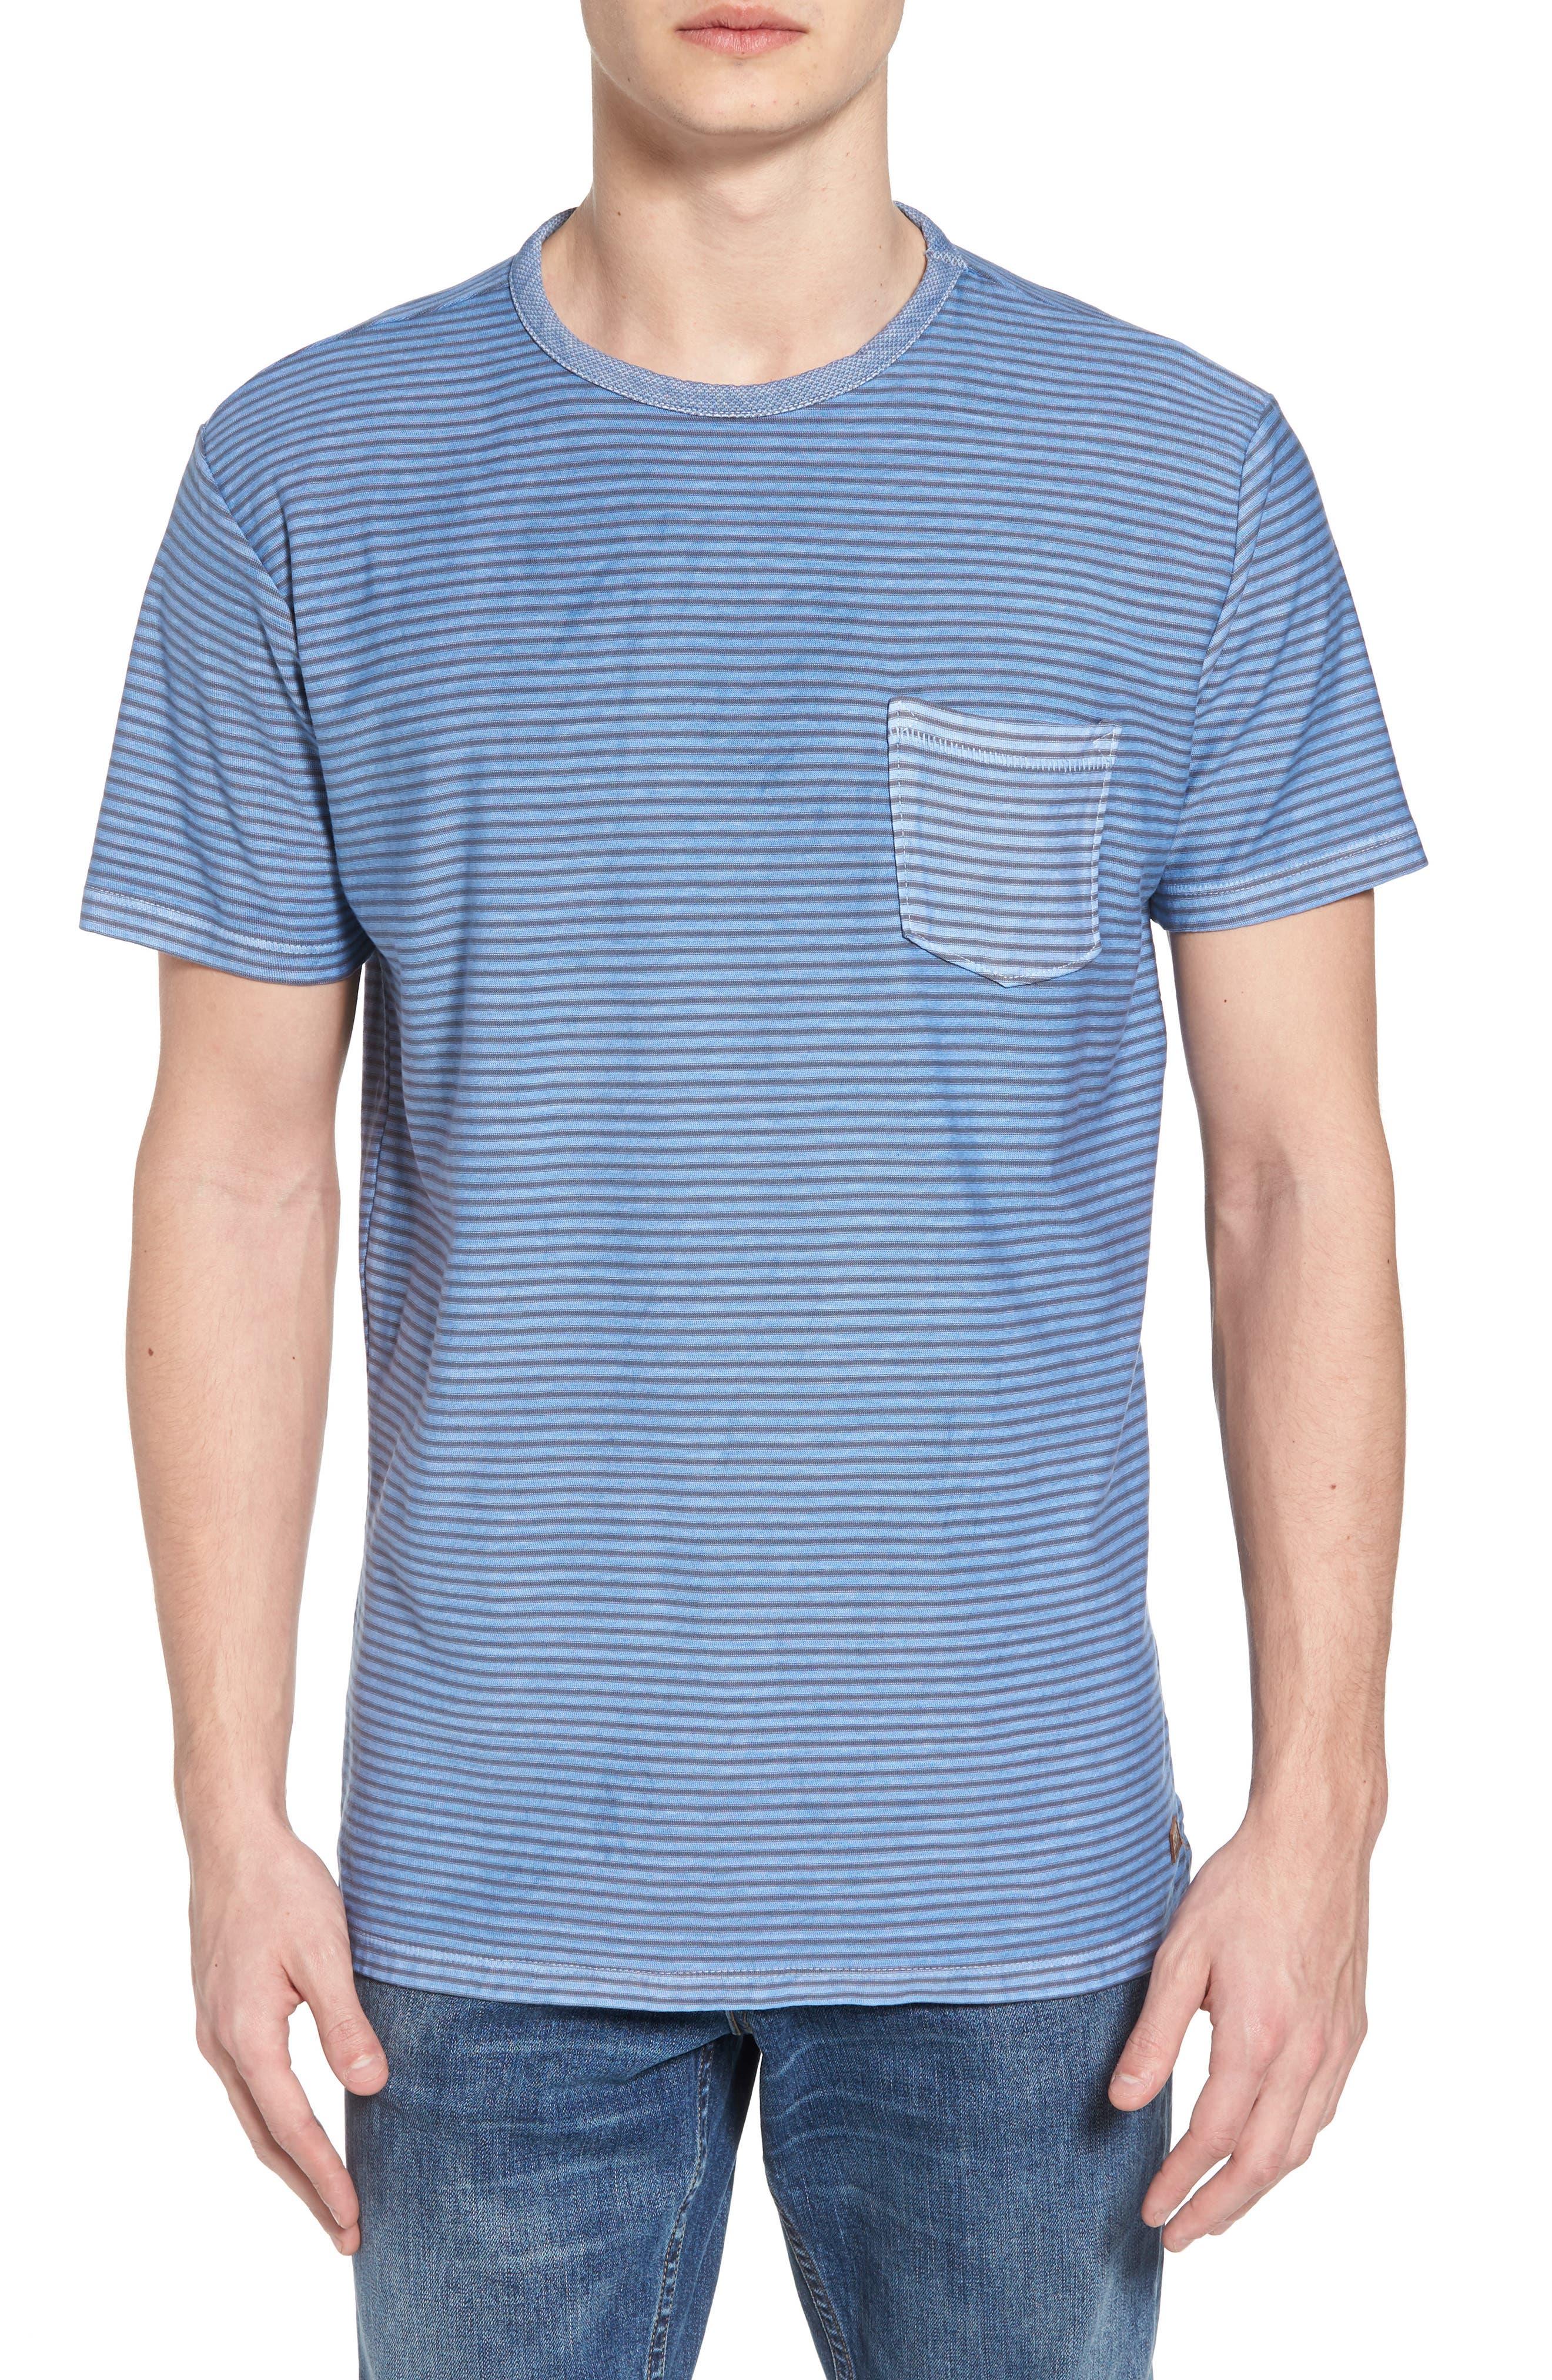 Stringer T-Shirt,                             Main thumbnail 1, color,                             Powder Blue